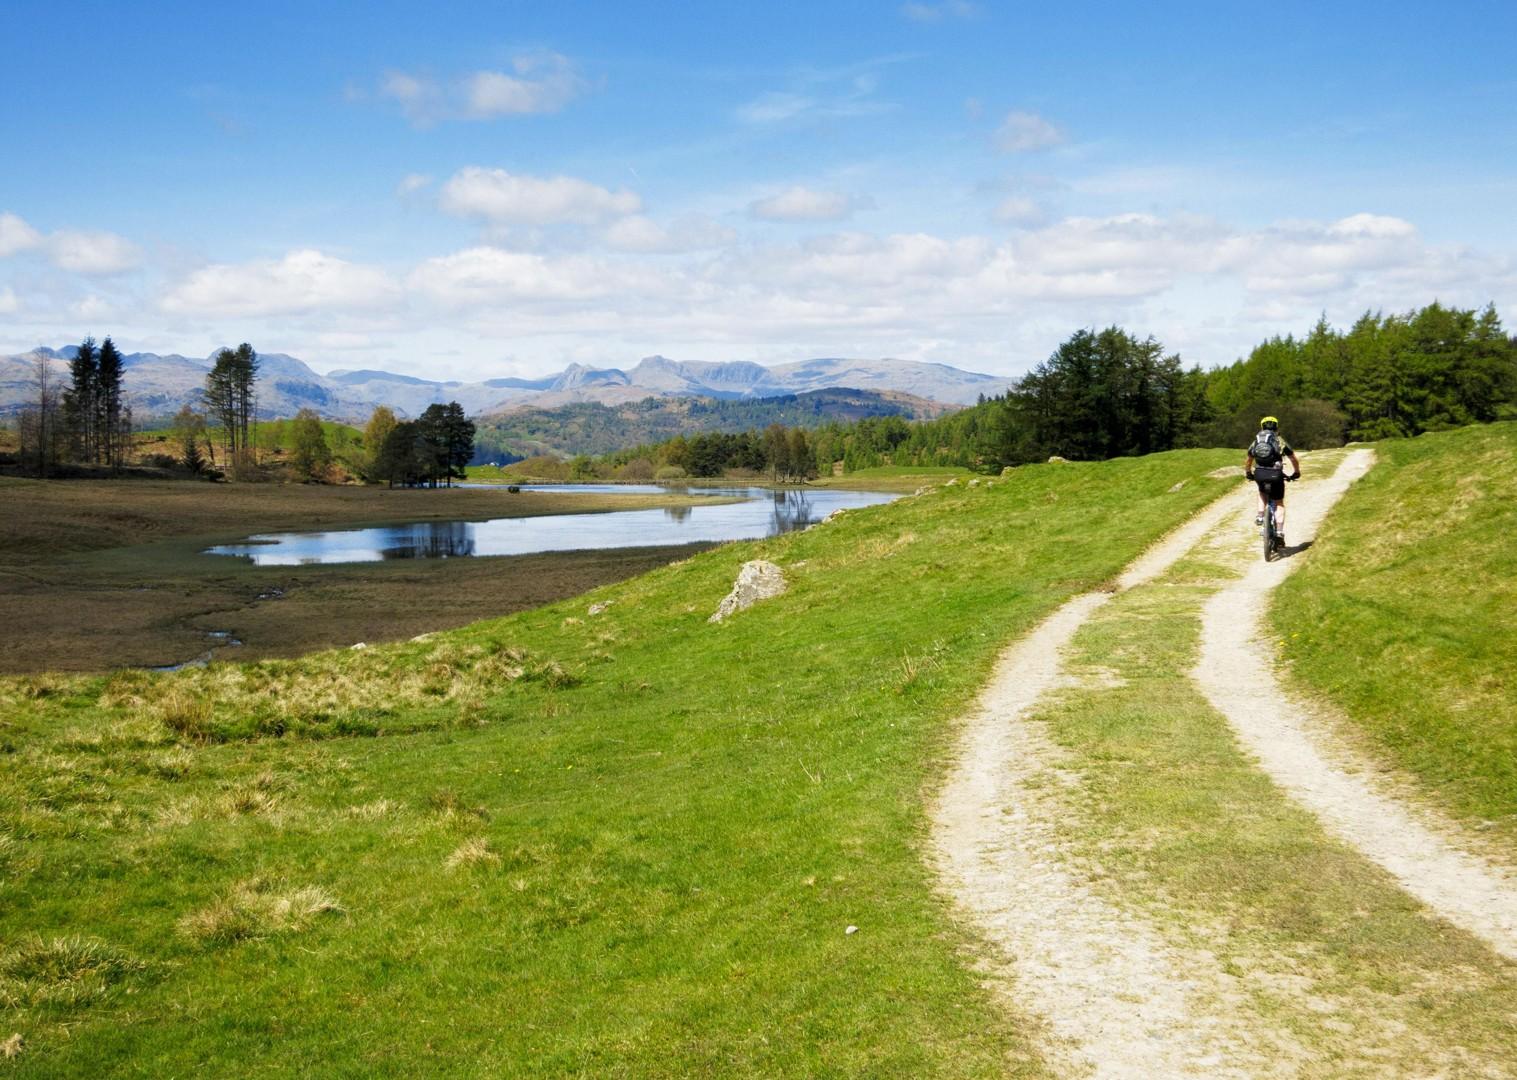 guided-mountain-bike-holida-in-UK-Lake-District-biking-coniston.jpg - UK - Lake District - Classic Coniston - Guided Mountain Bike Weekend - Mountain Biking